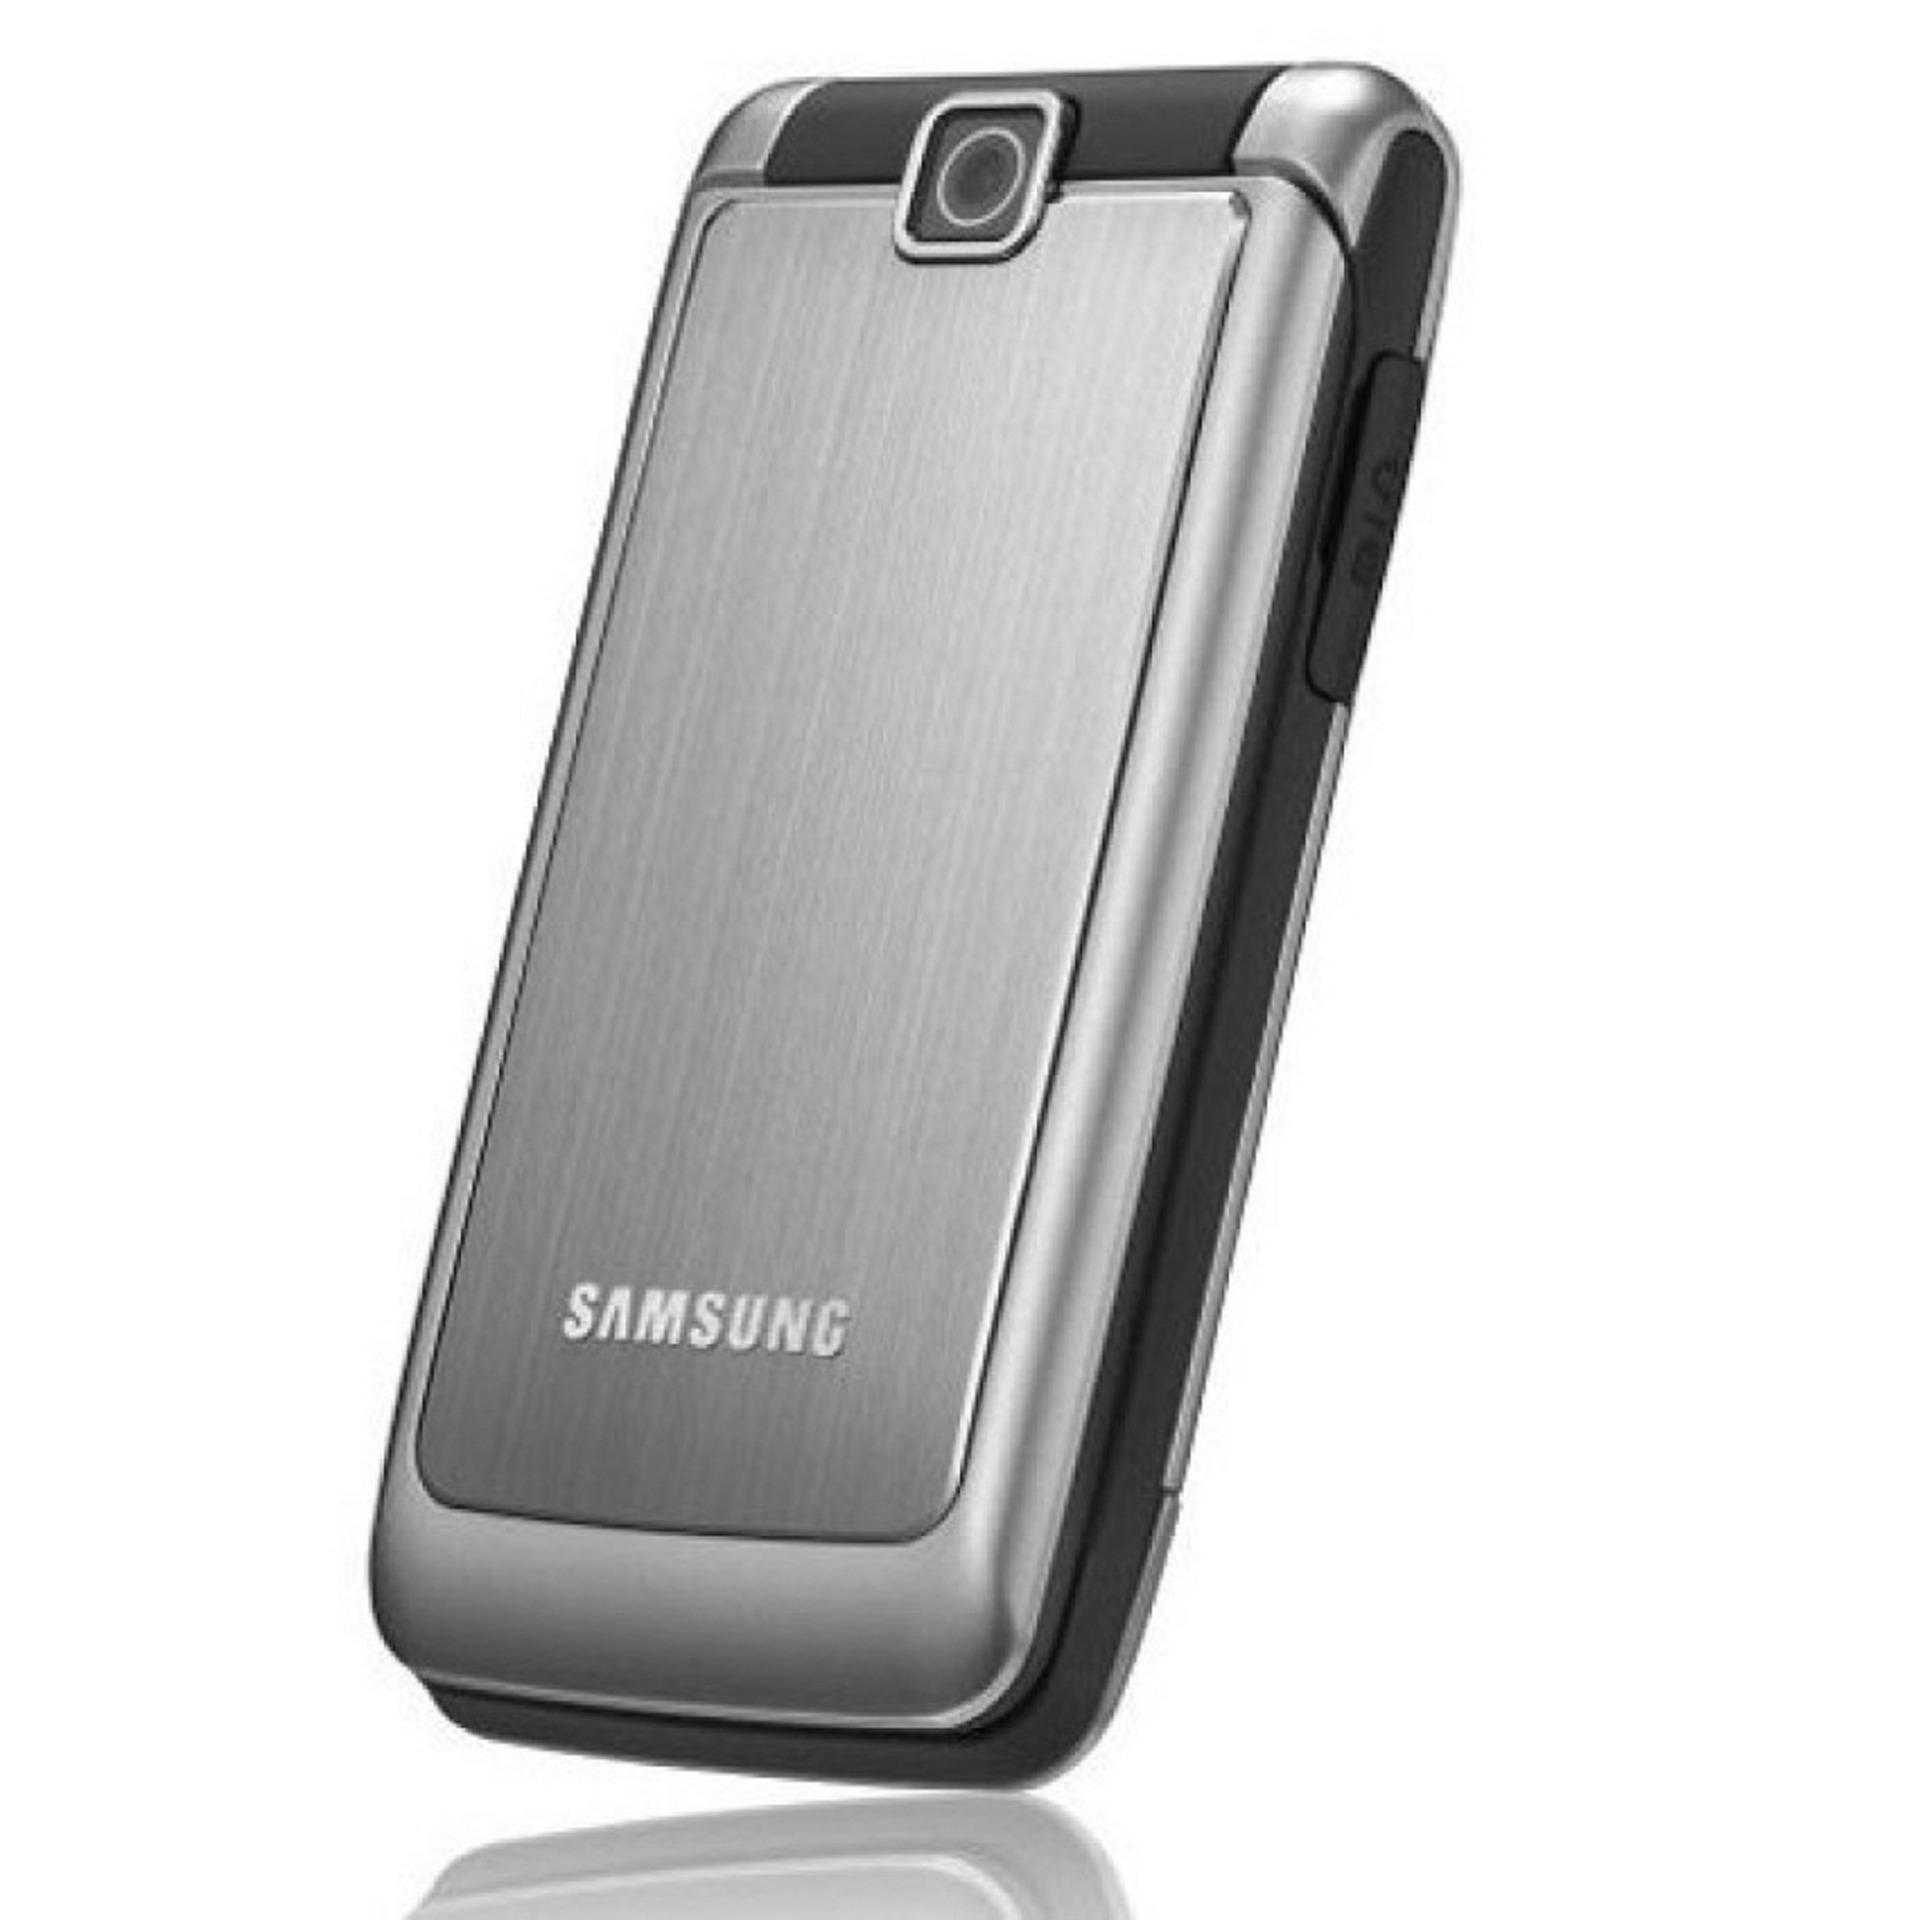 Samsung Galaxy J3 Pro J330 2 16 Gb 4g Lte Pink Indonesia 2017 Garansi Resmi Sein S3600i Flip Brand New Refurbished